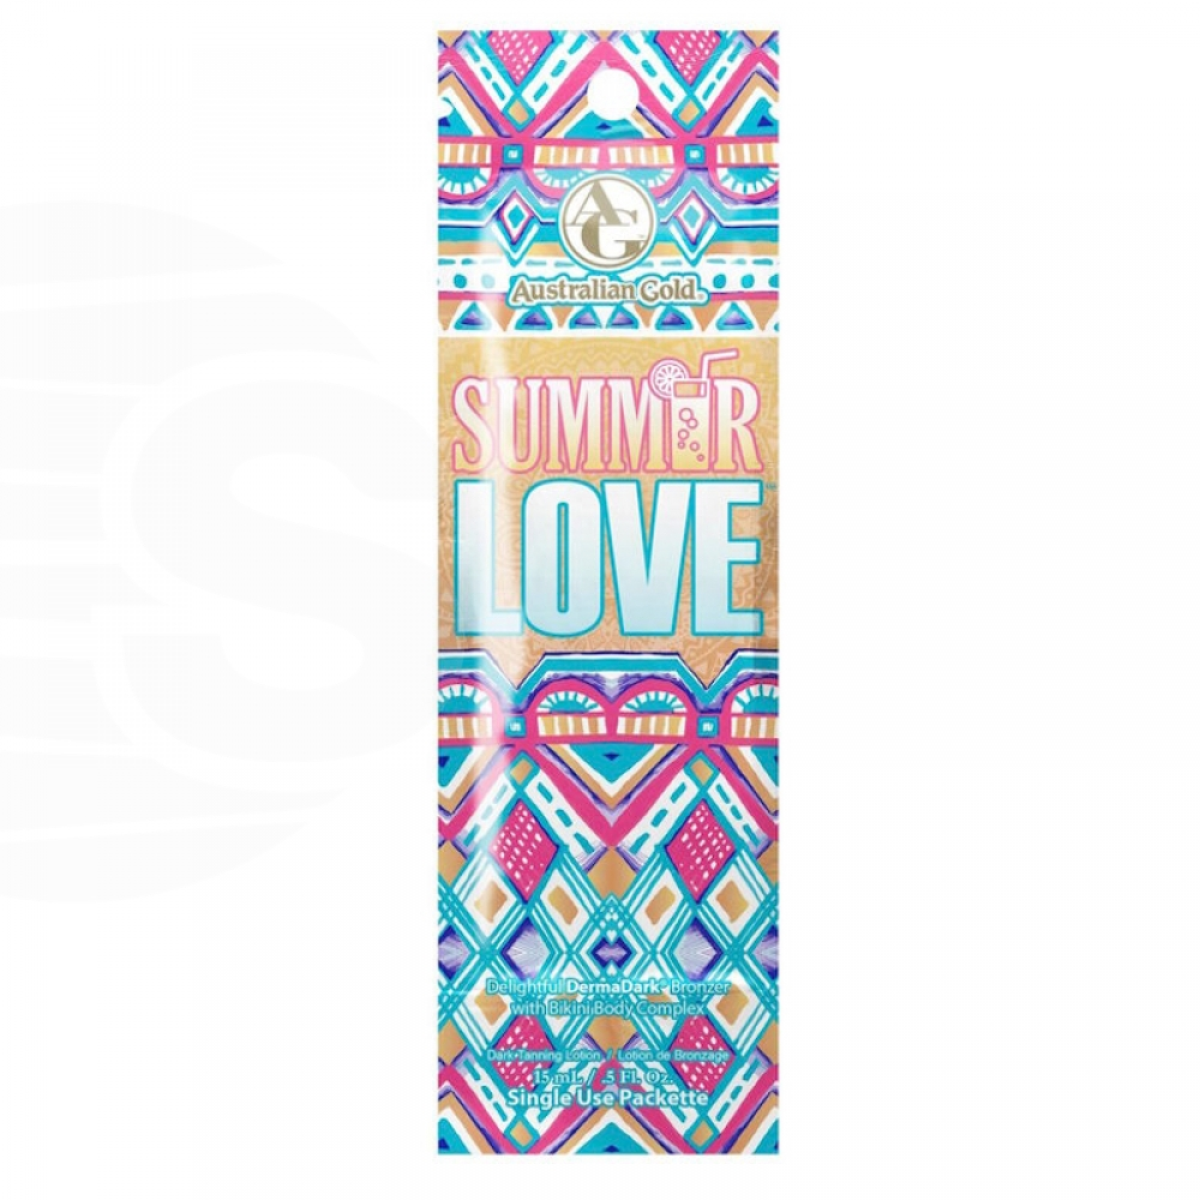 Summer Love 15ml - Australian Gold